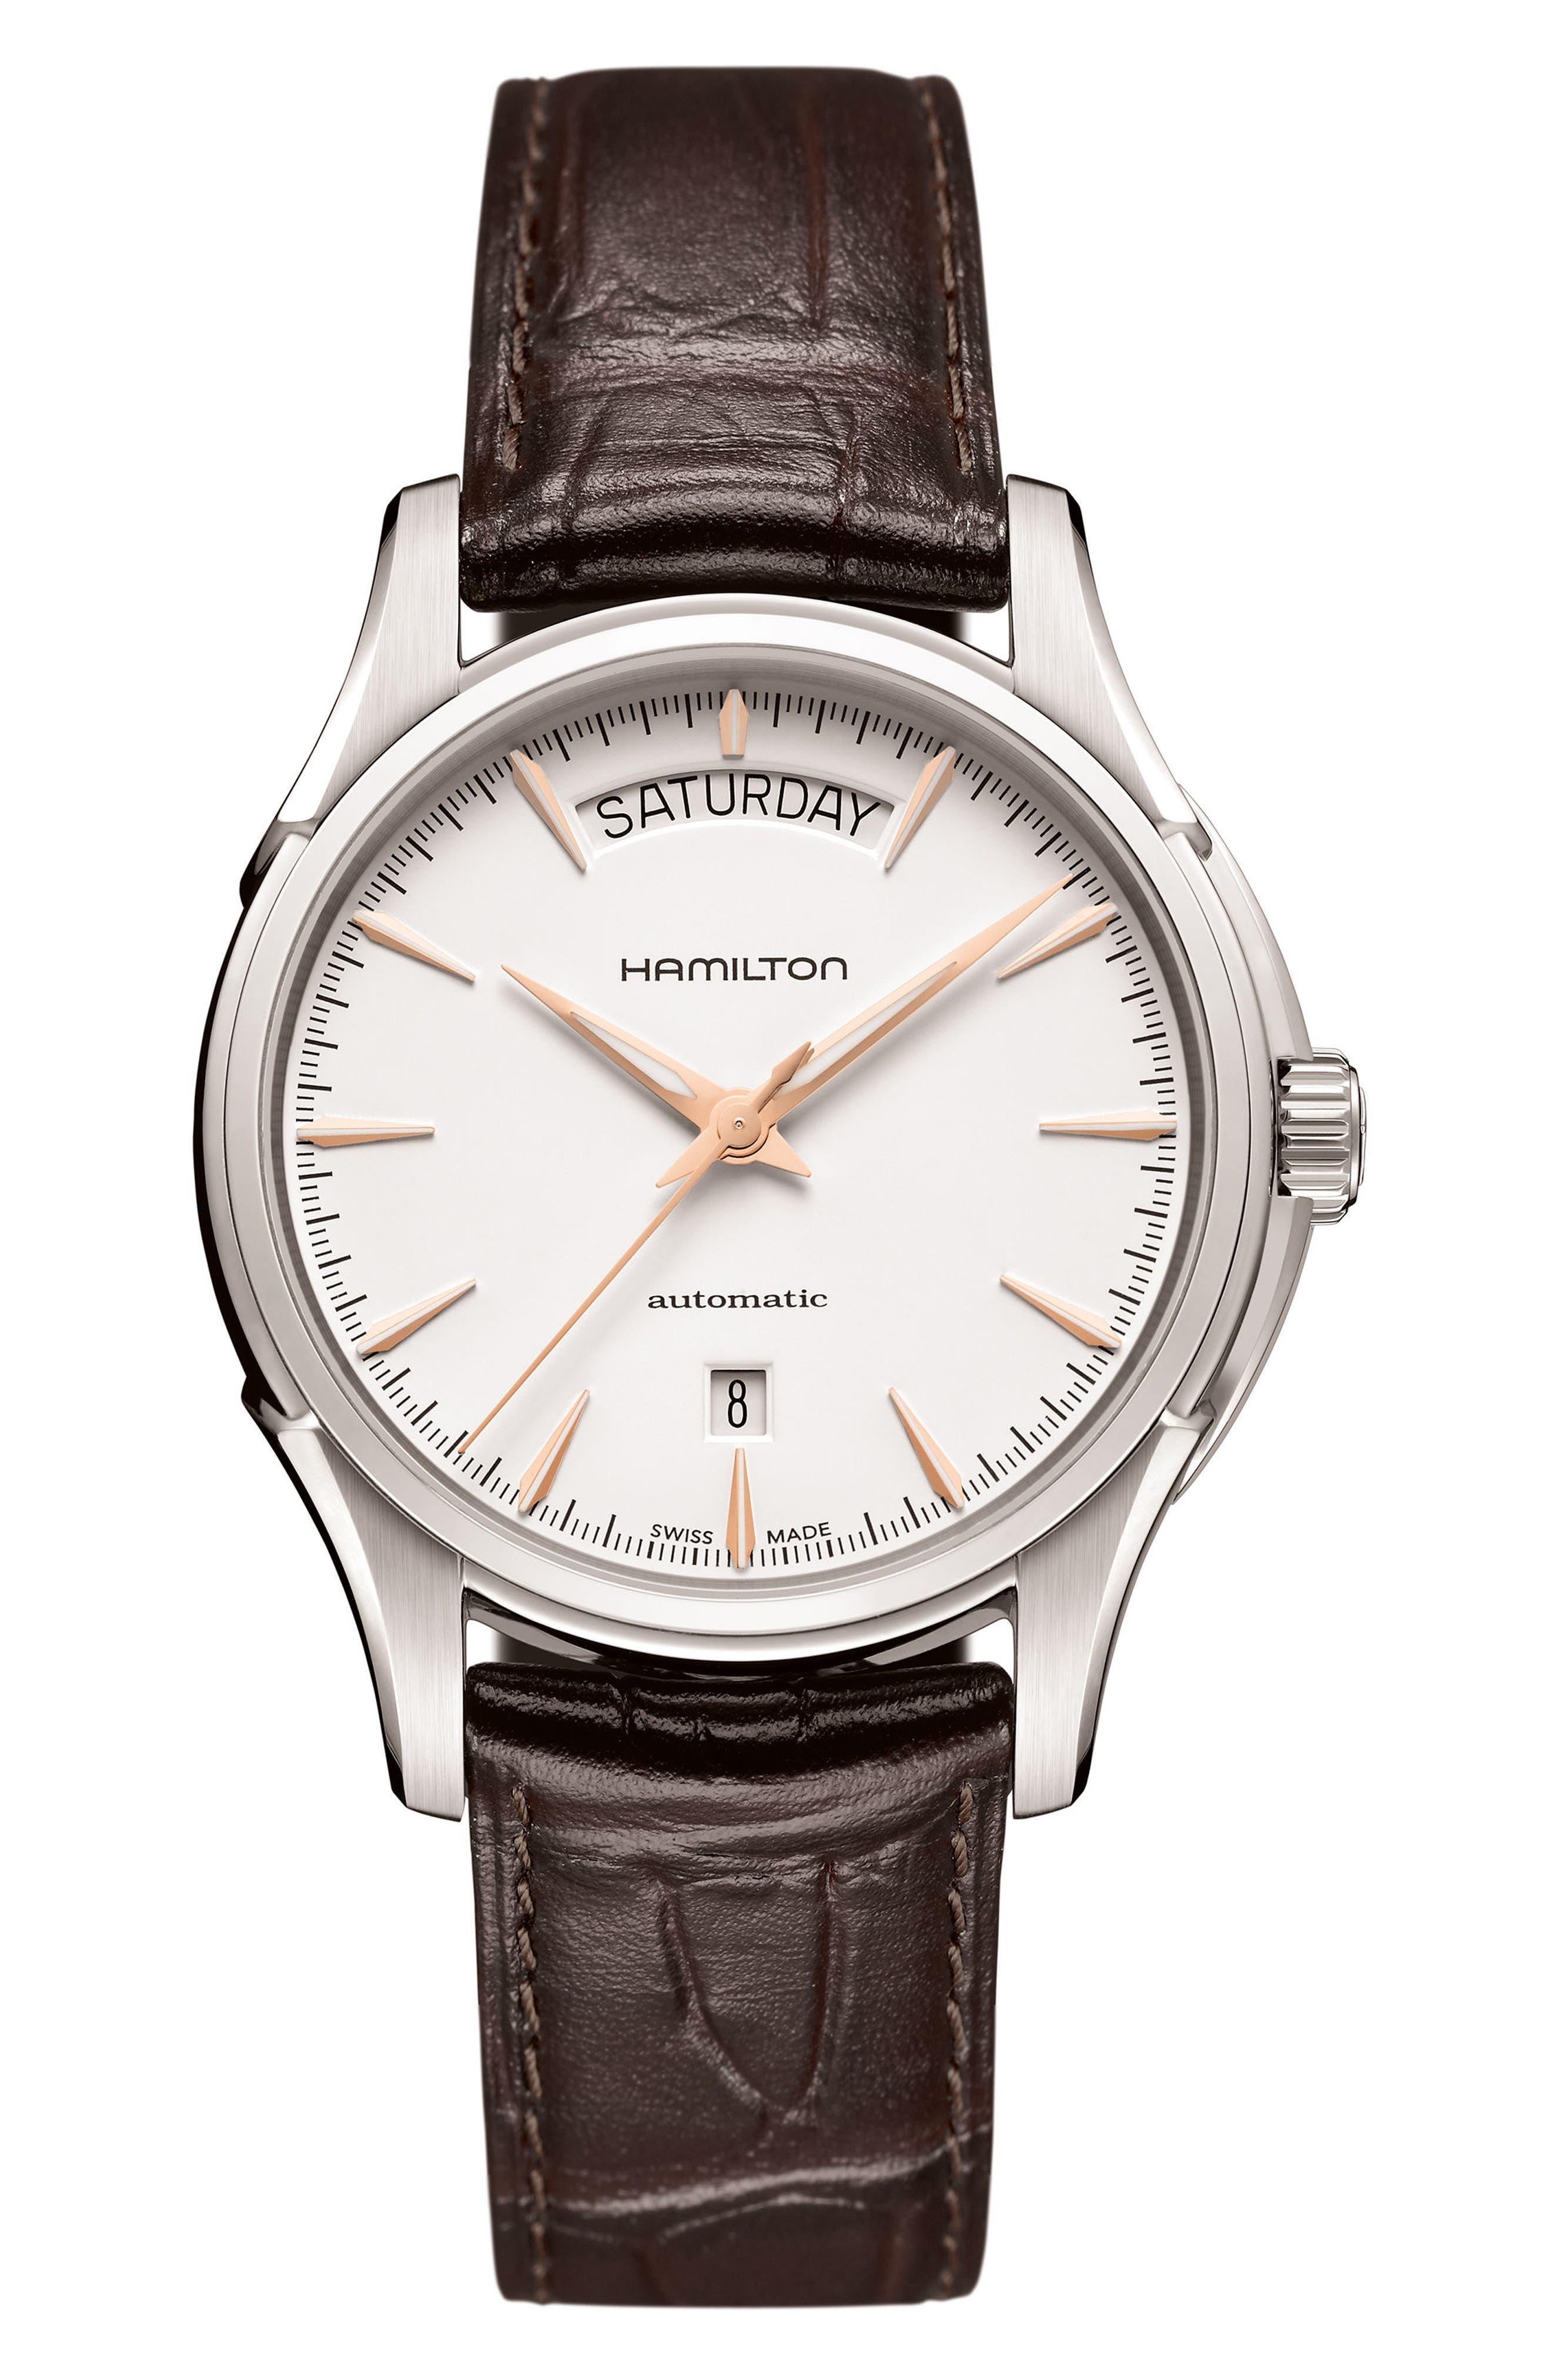 Main Image - Hamilton Jazzmaster Automatic Leather Strap Watch, 40mm